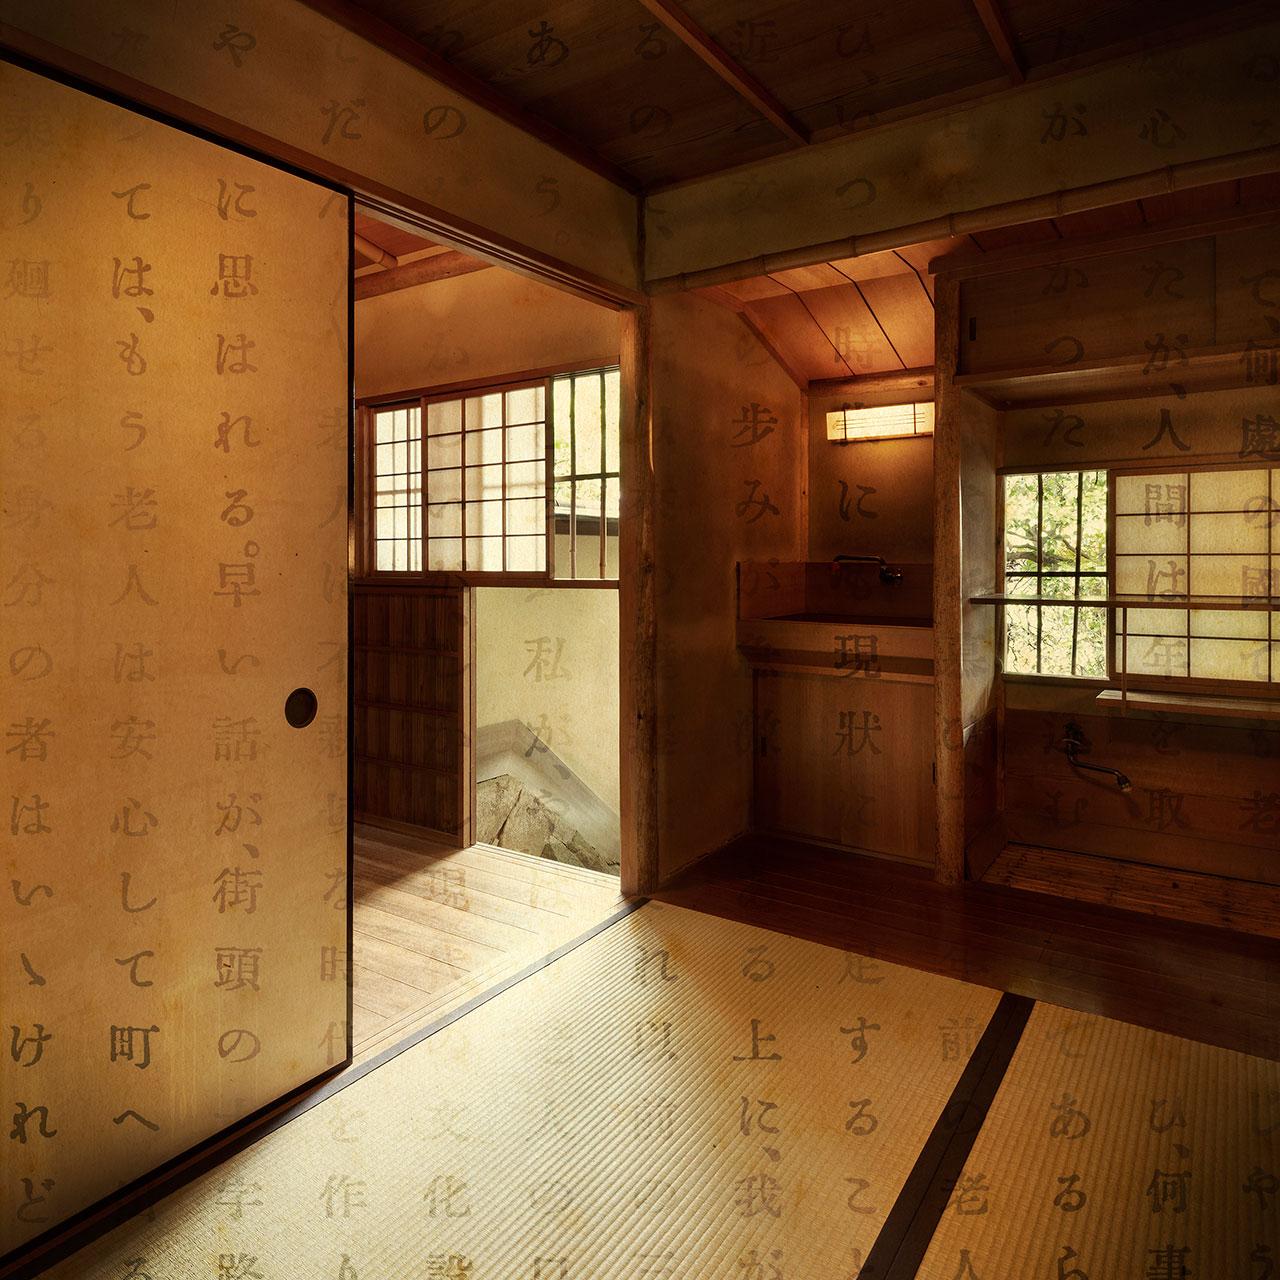 Inês d'Orey,Inomata House #2,1967. Nakano-Ku, By Isoya Yosida & Associates.80x80cm. Photographic Fine Art Print.